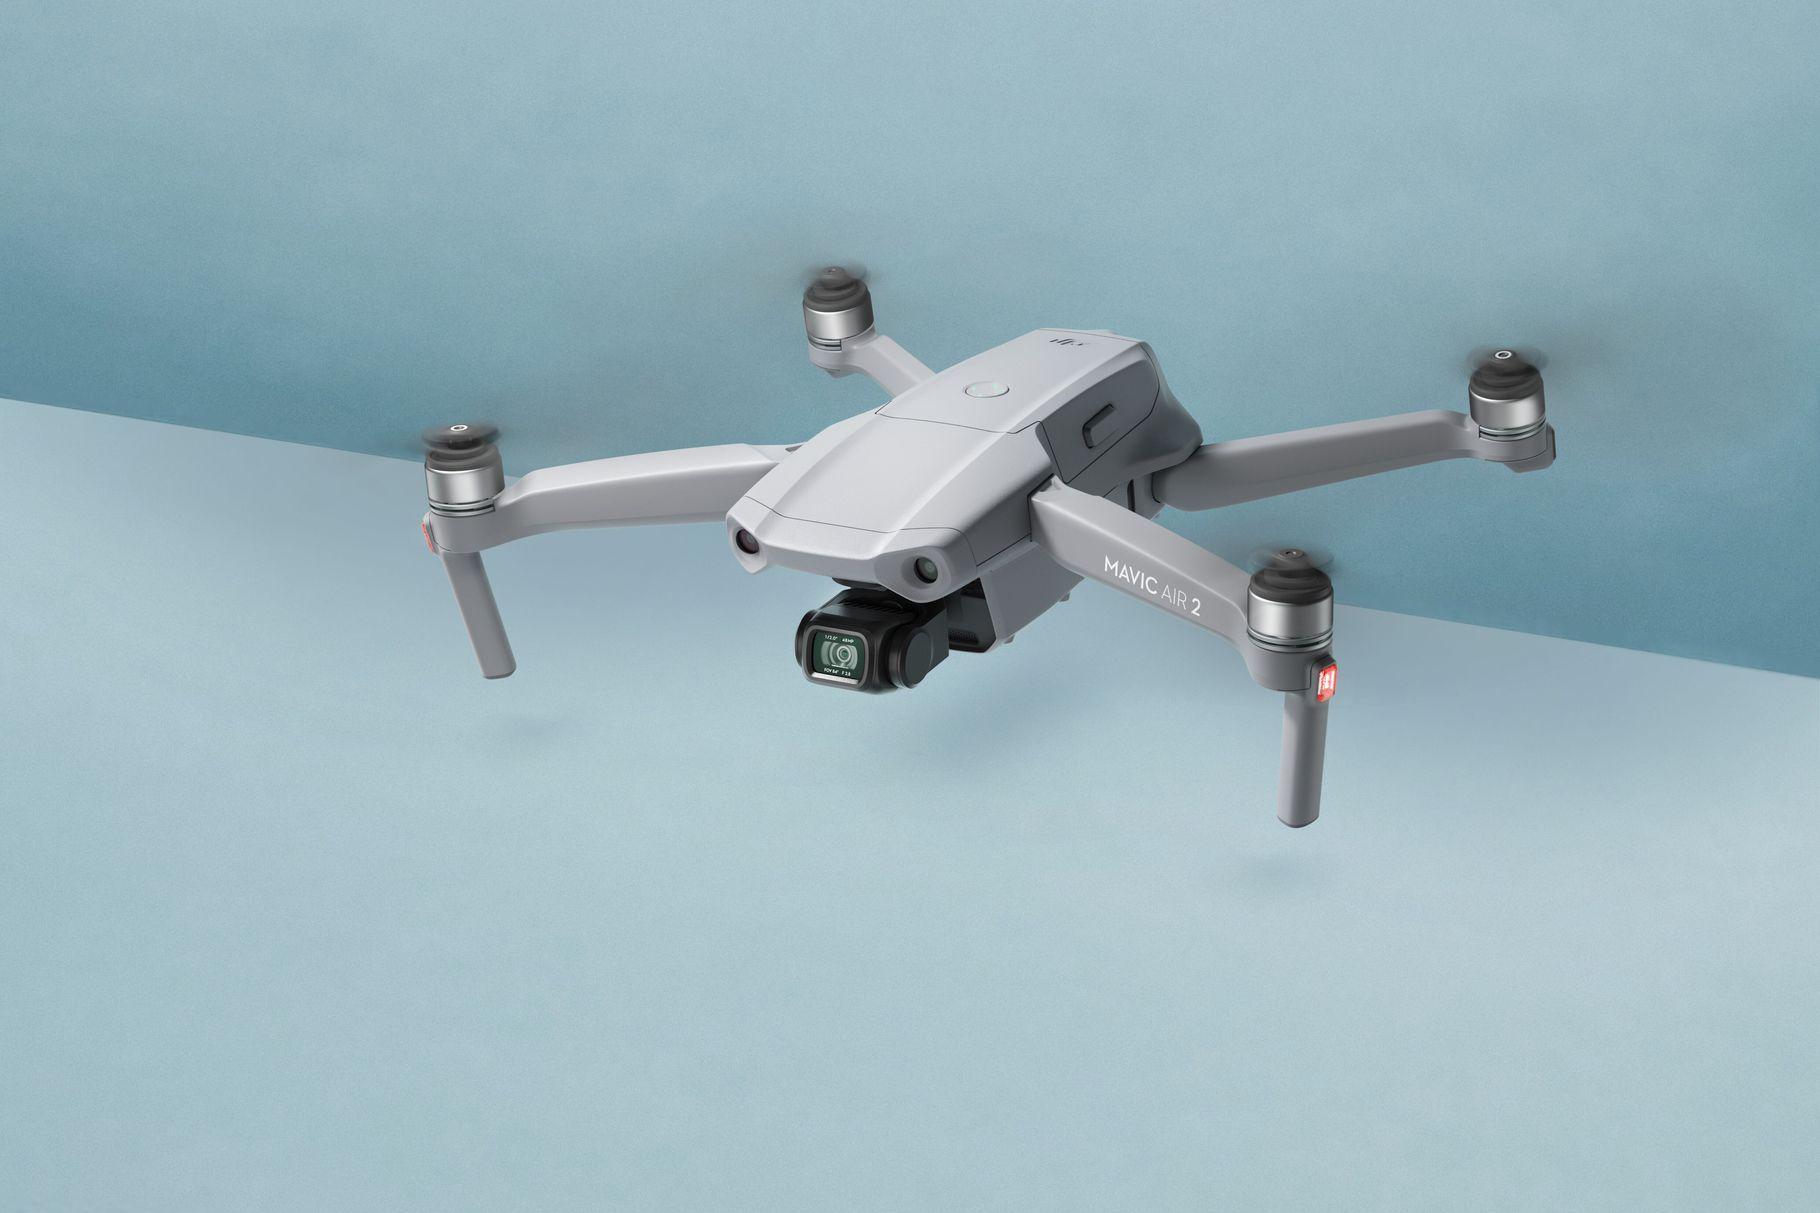 DJI выпустила дрон Mavic Air 2 с камерой на 48 мегапикселей